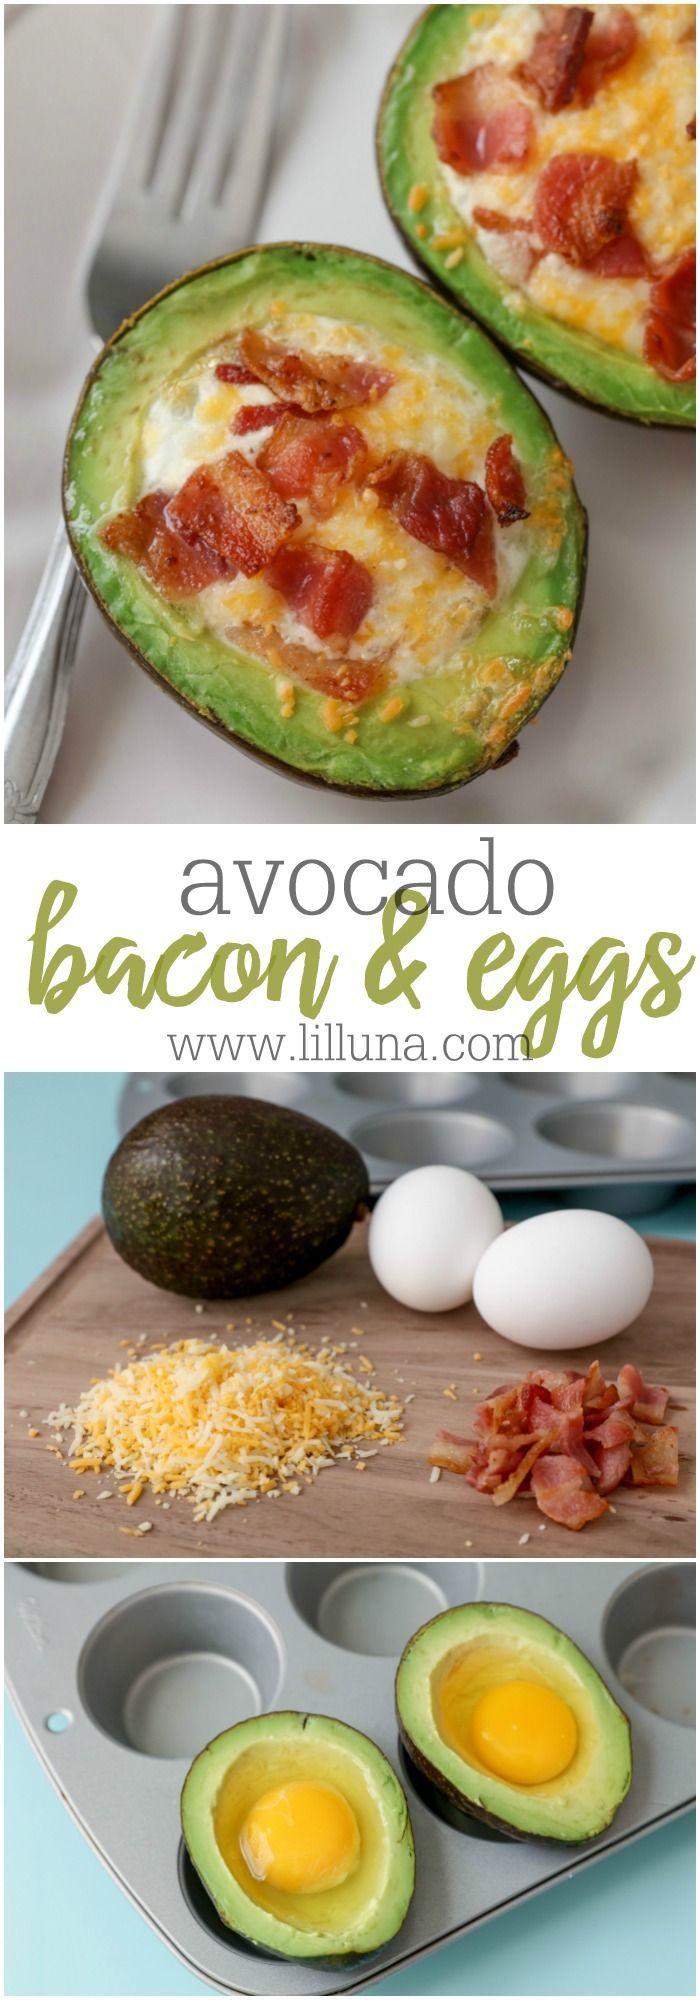 IDEA Health and Fitness Association: Avocado Bacon and Eggs